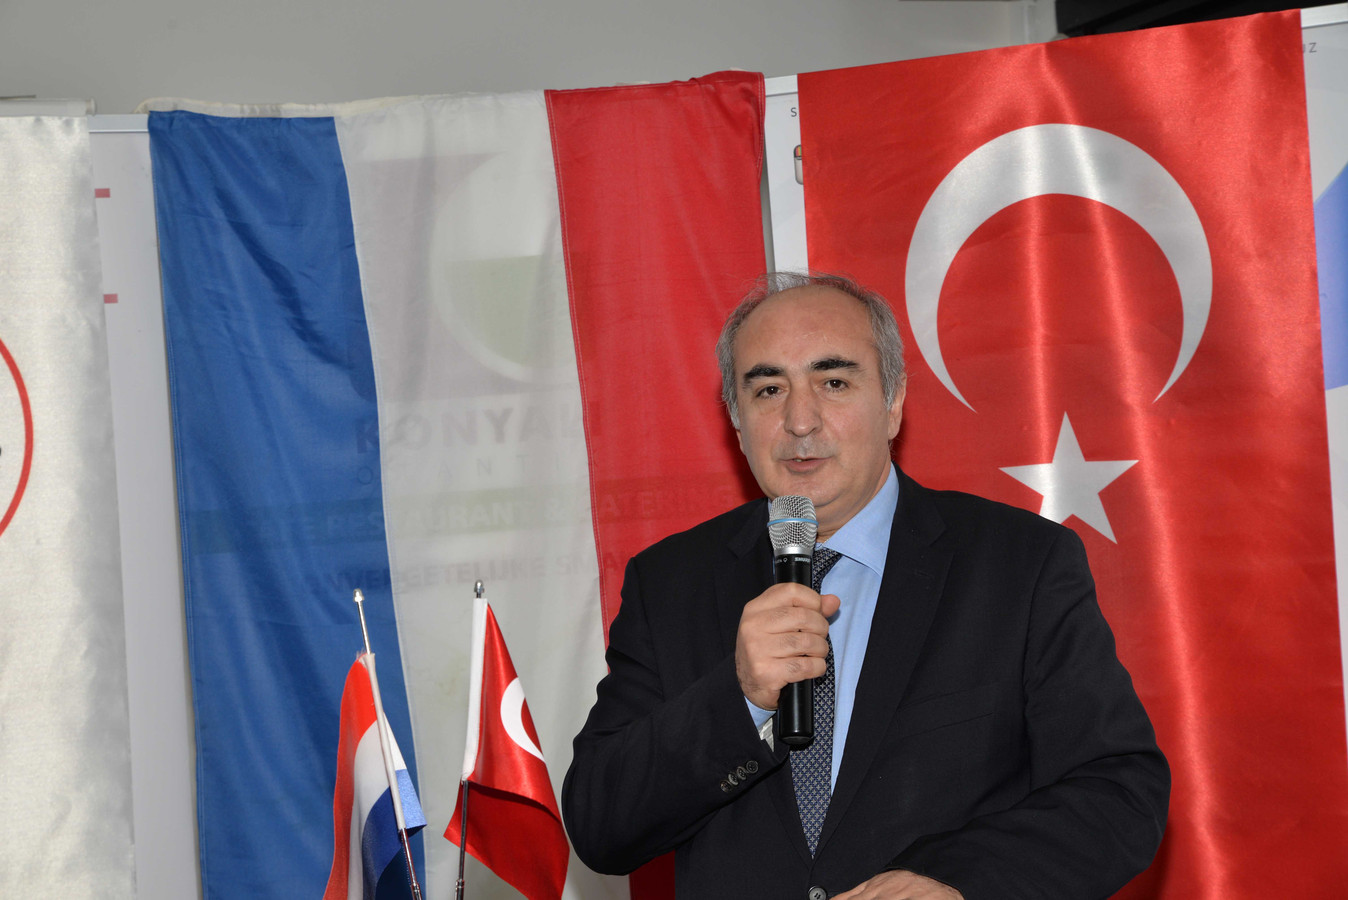 Turkse ambassadeur den haag al maanden topadviseur erdogan for Turkse reisbureau den haag